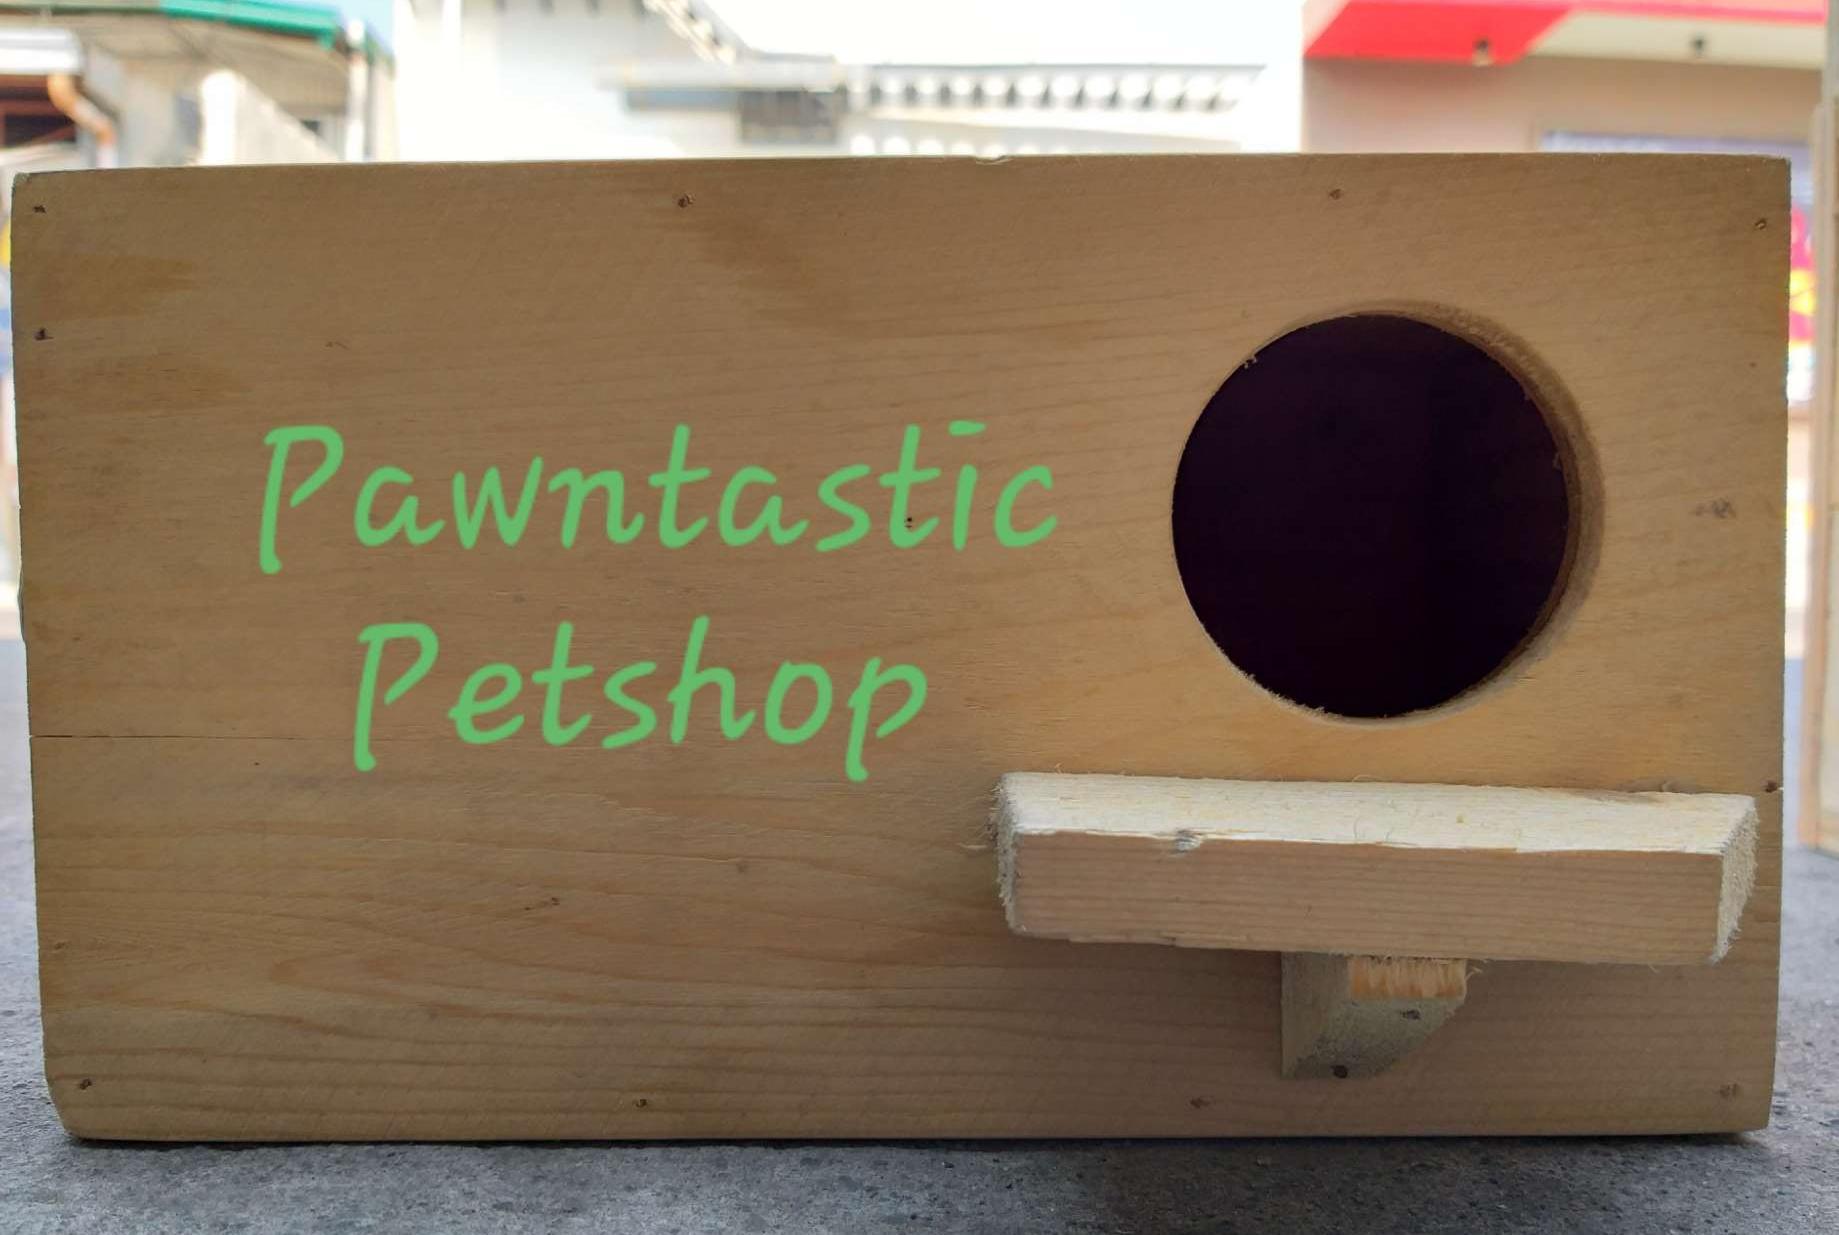 Birds Nest 1 By Pawntastic Petshop.